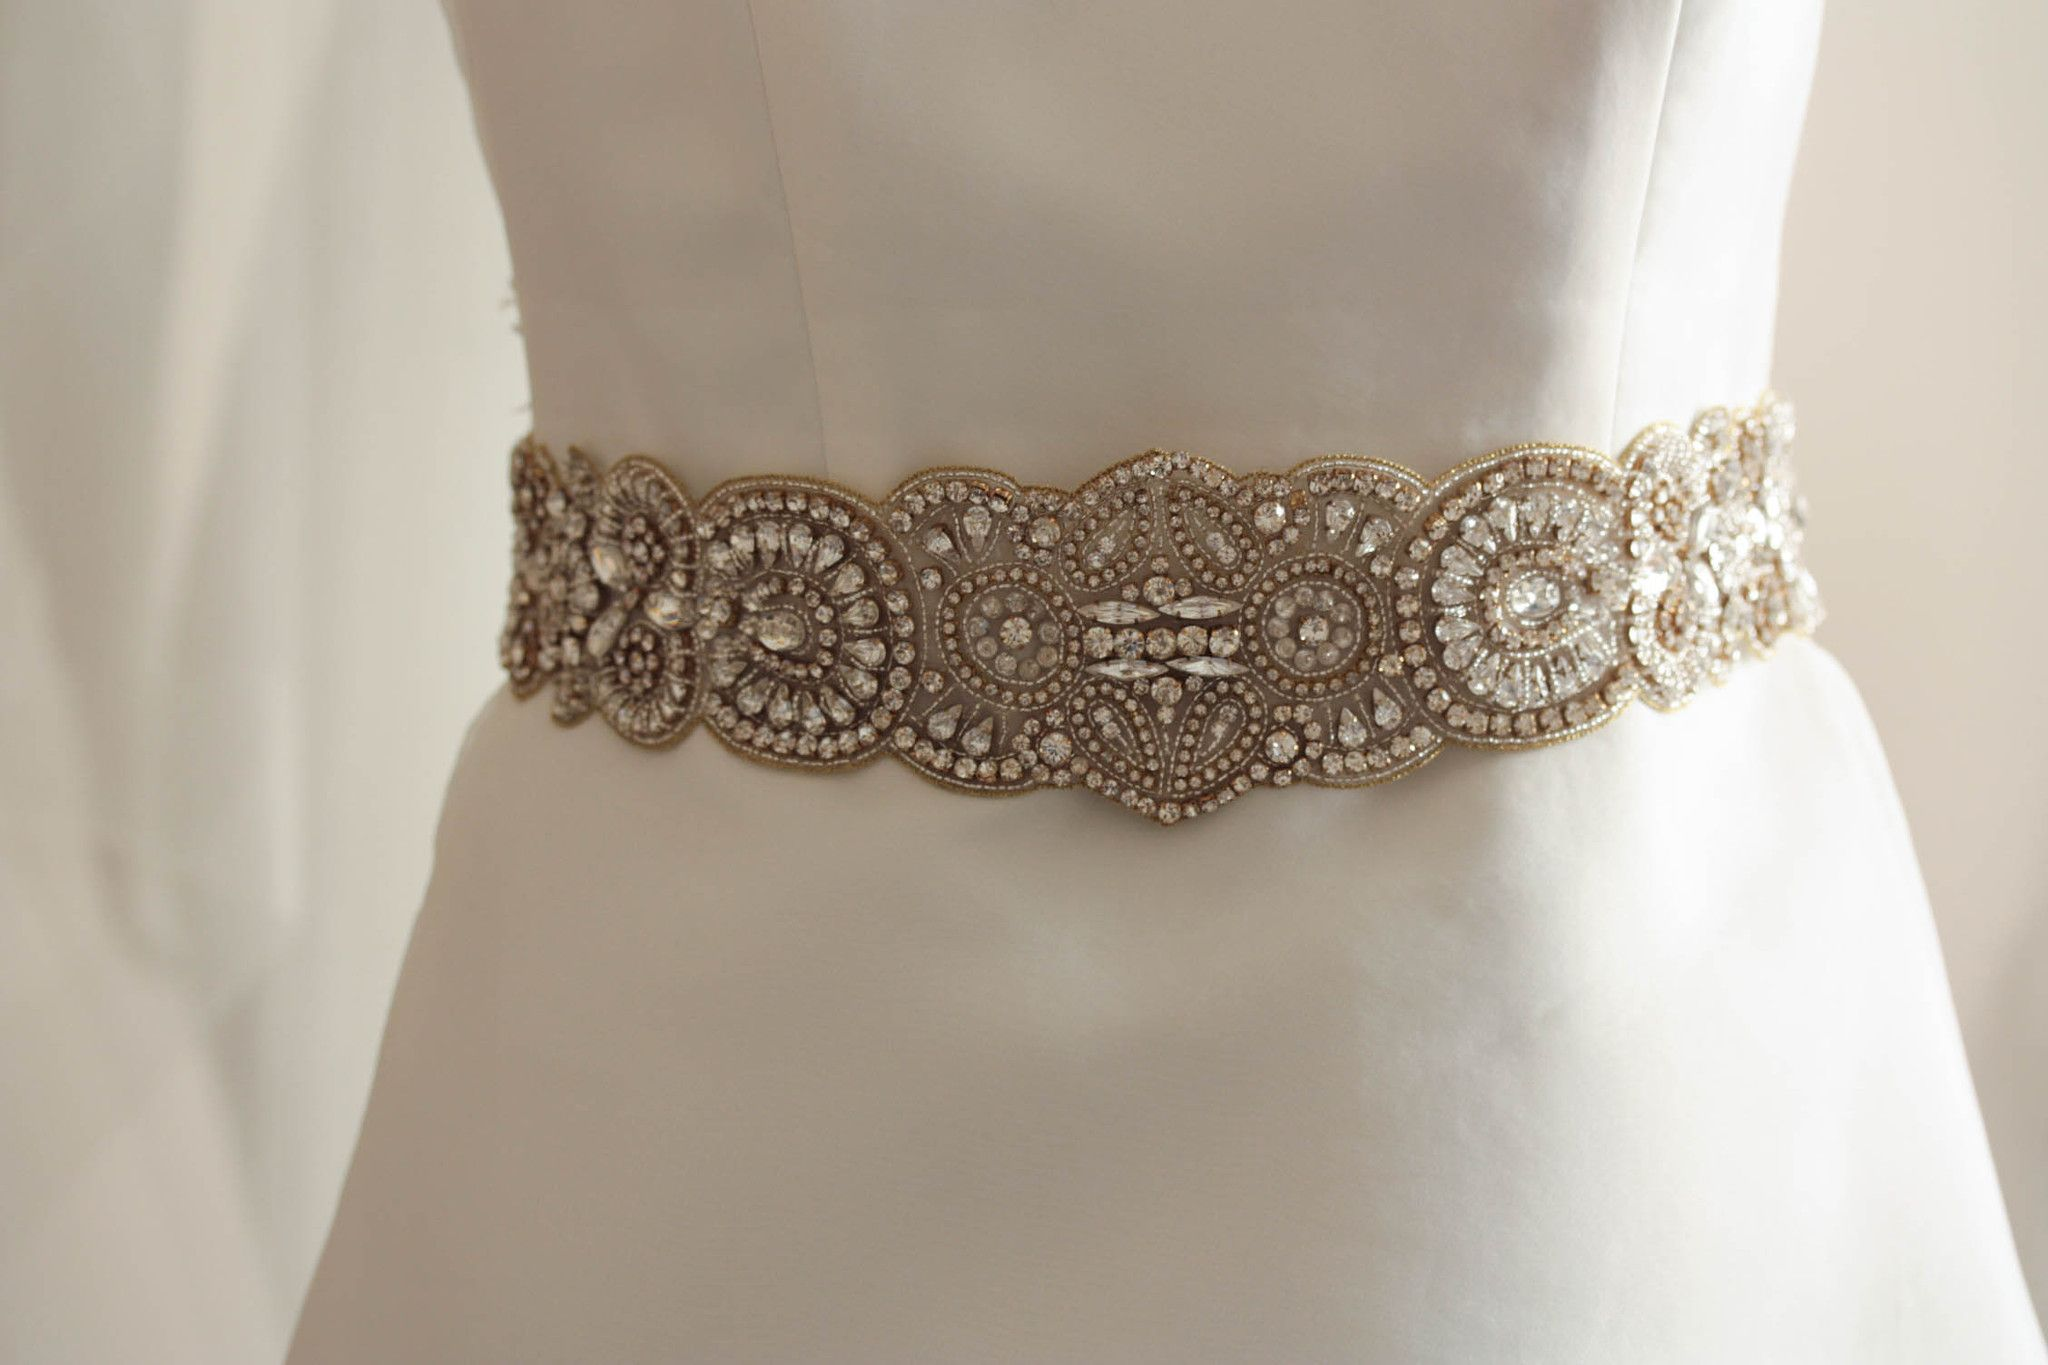 Bridal Sashes Google Search Wedding Bridesmaids My Lovely